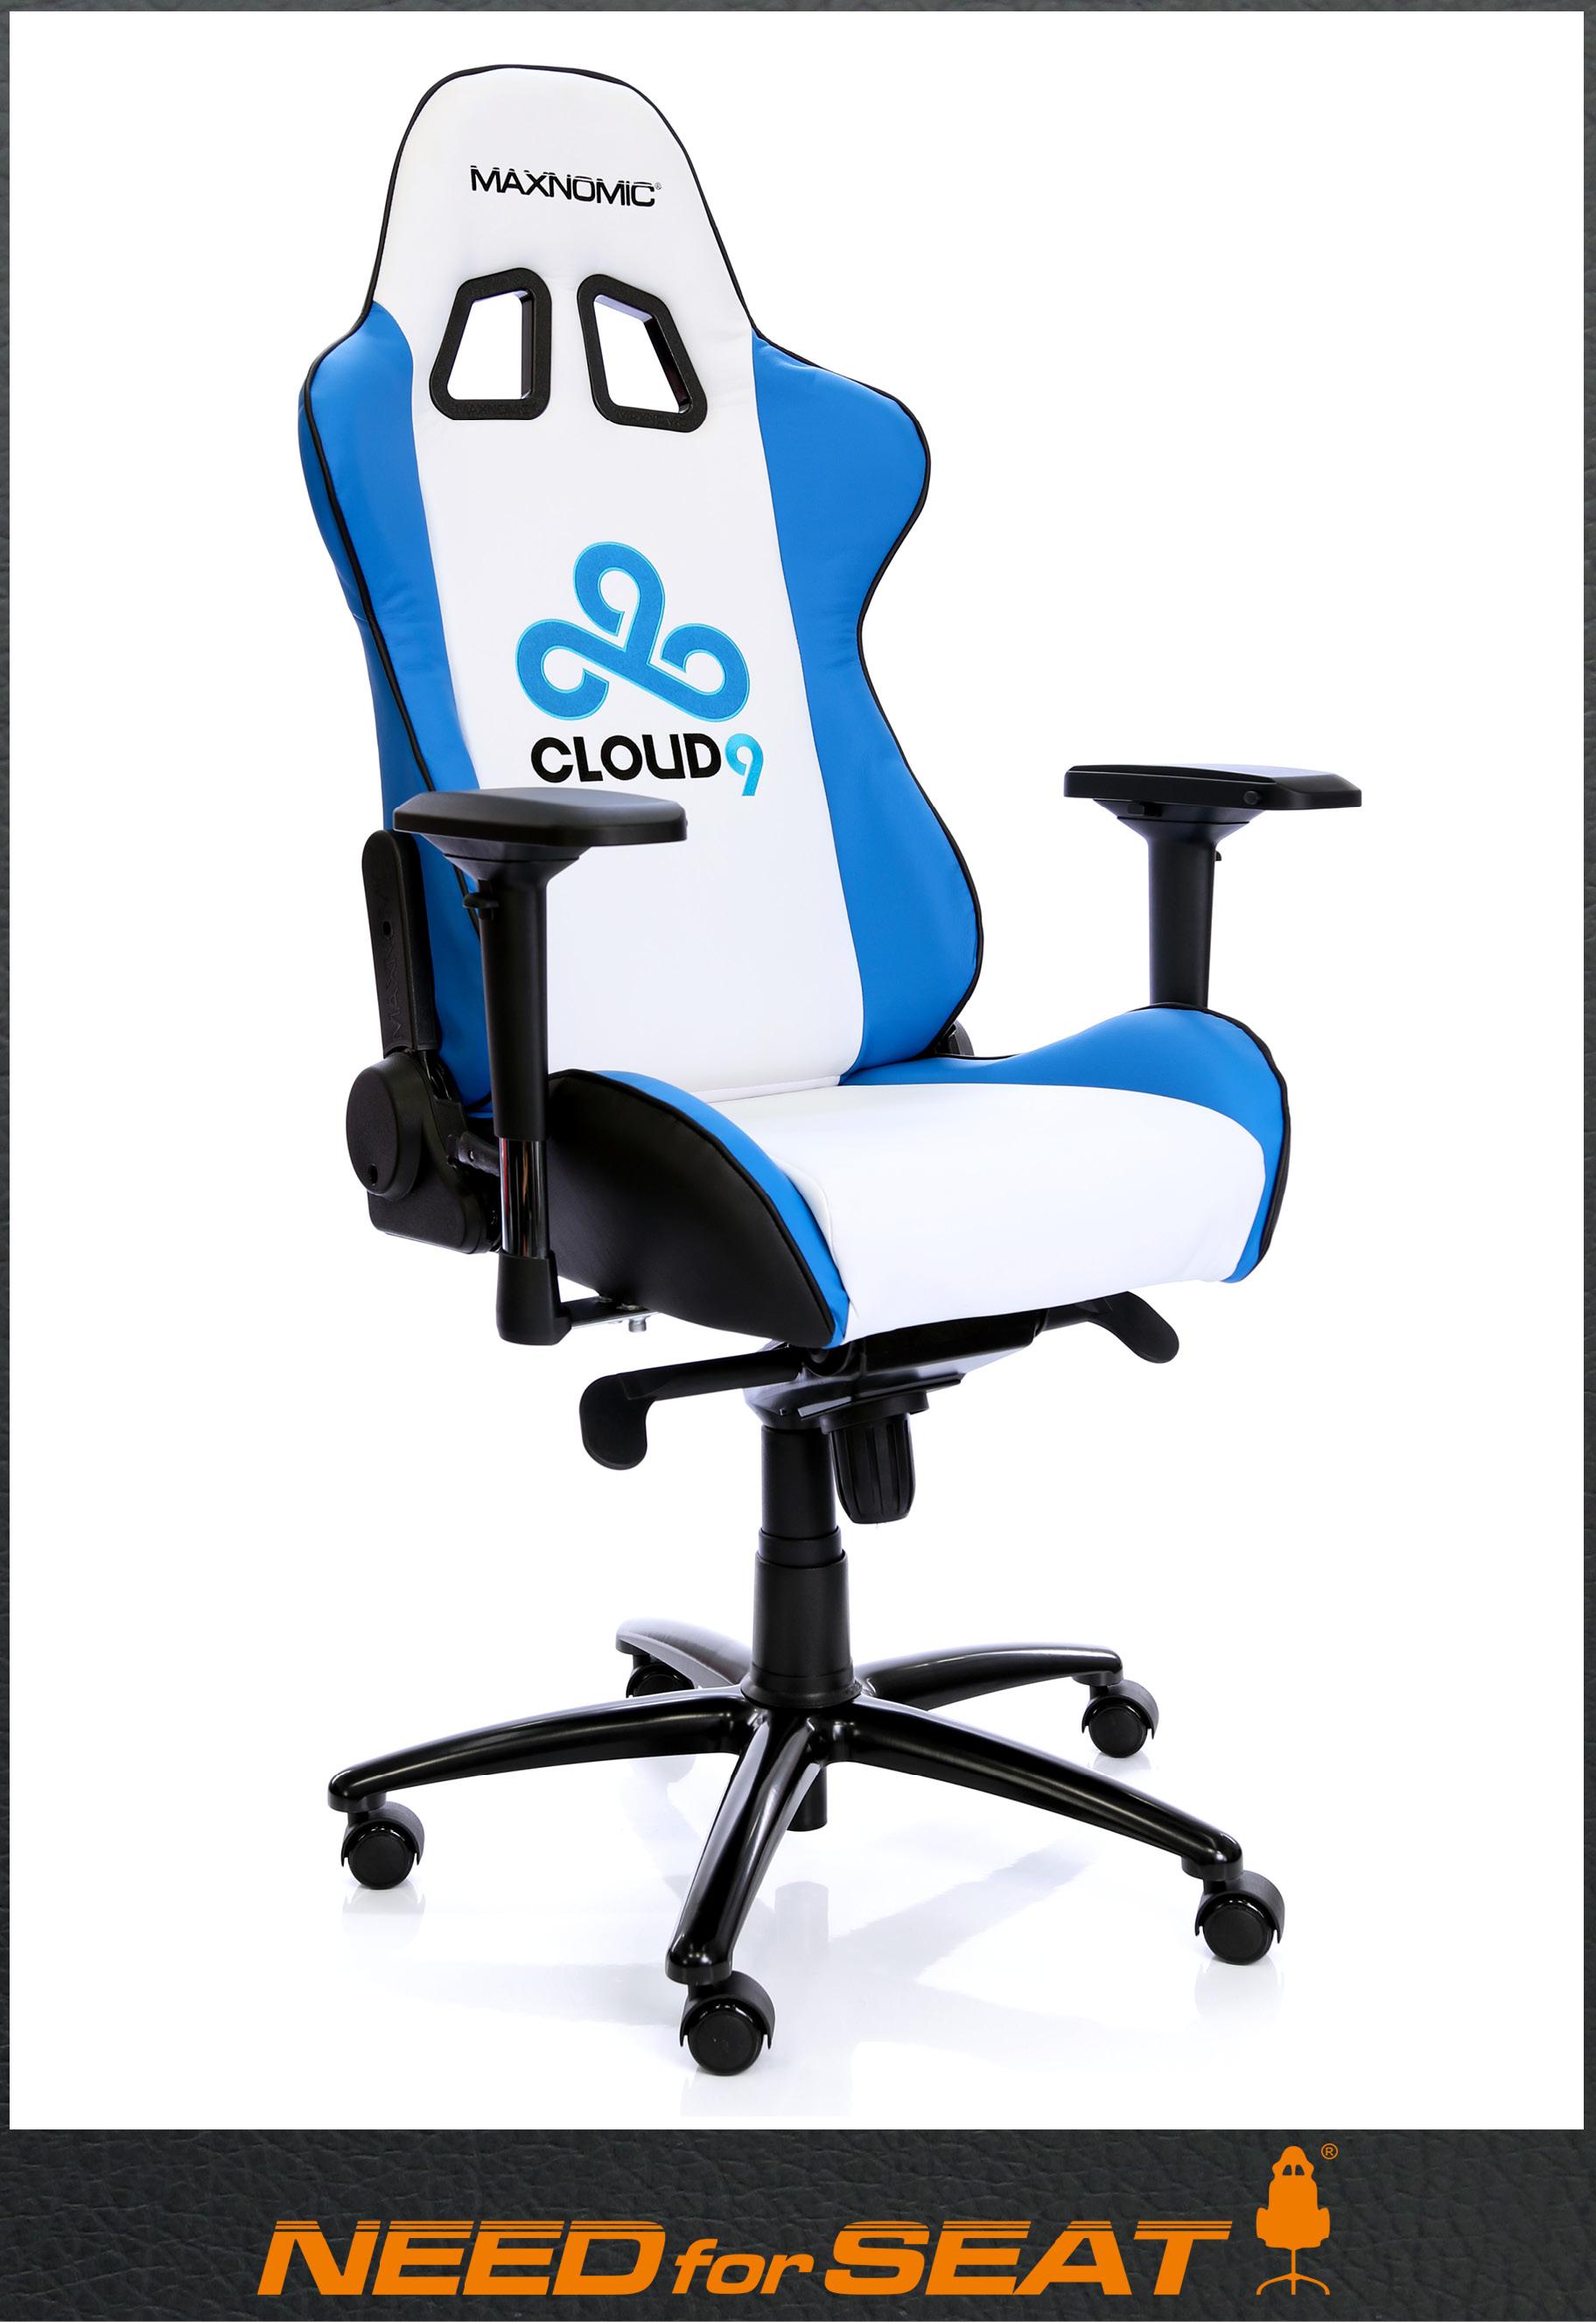 maxnomic cloud9 cas shop now needforseat en. Black Bedroom Furniture Sets. Home Design Ideas